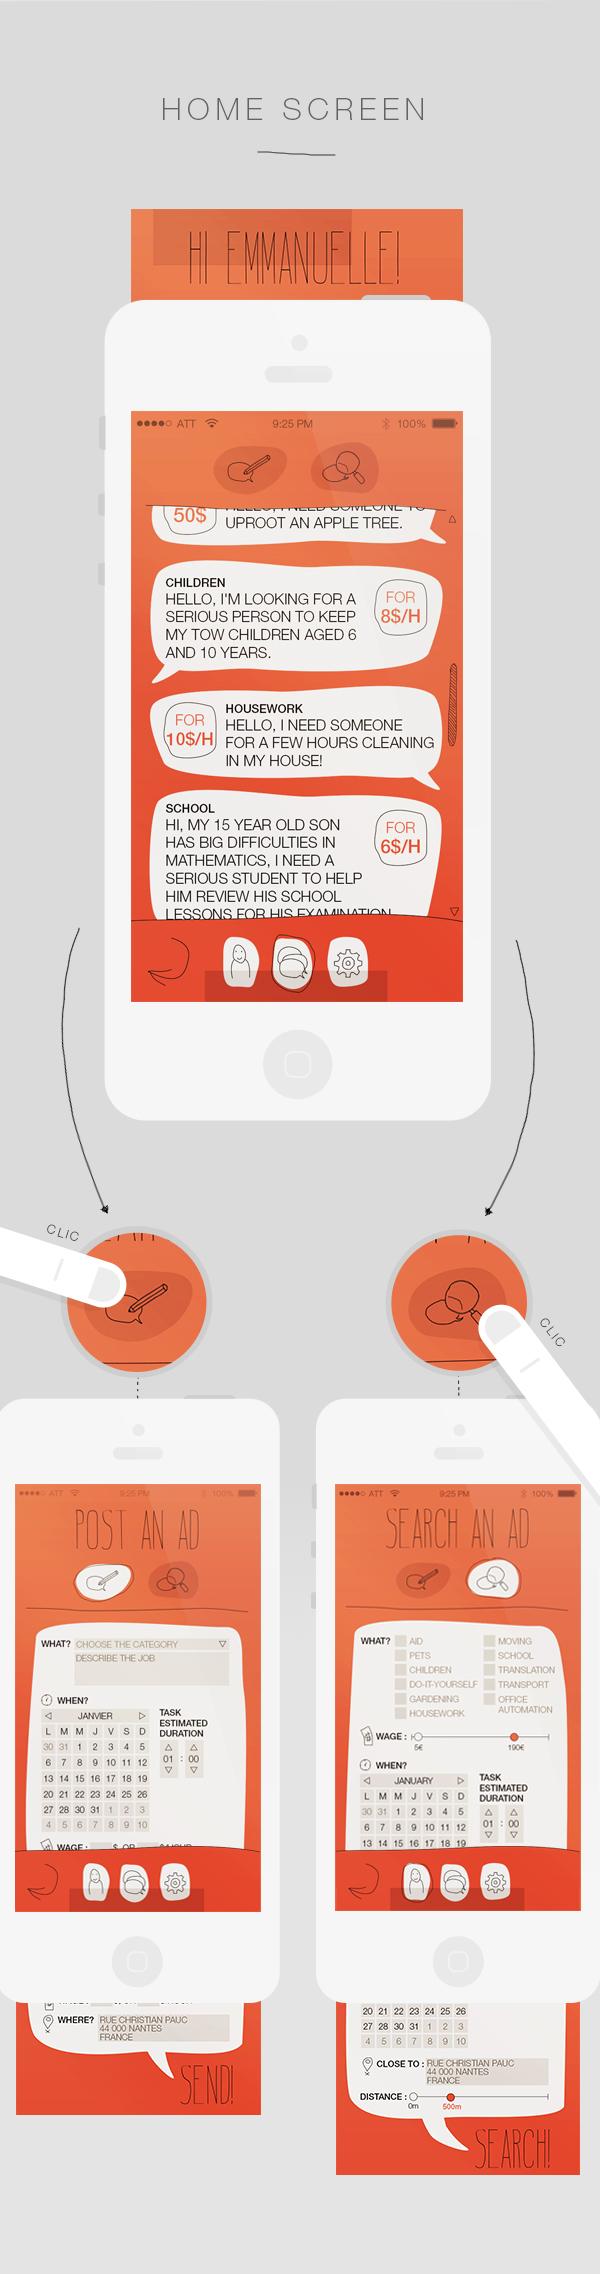 app  money balloon Form job ad research mobile odd job handmade red orange neighborhood video finger